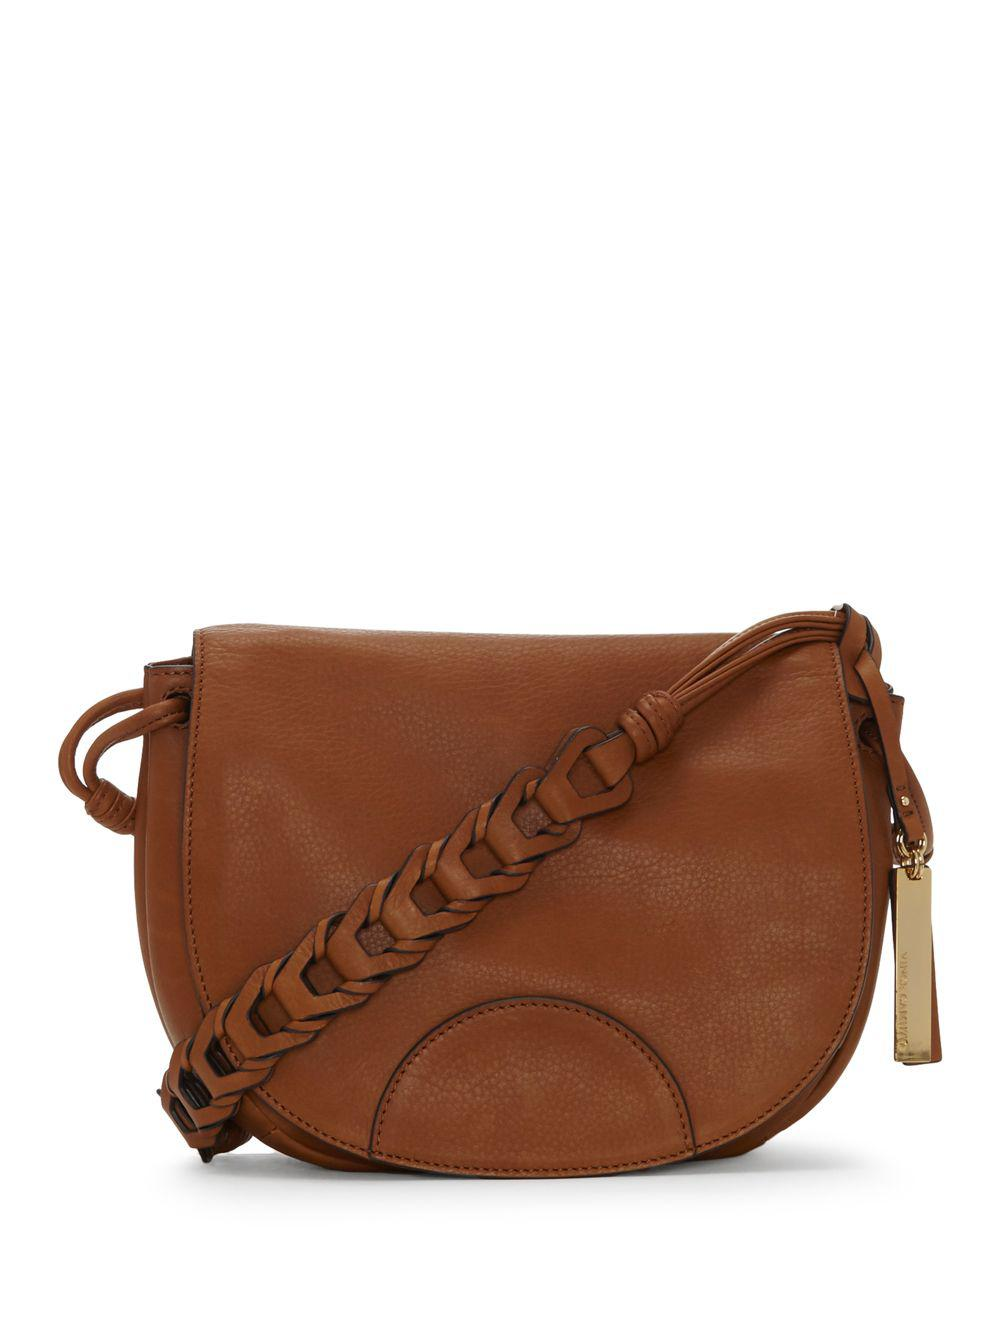 Lyst - Vince Camuto Luela Flap Medium Shoulder Bag in Brown 898036cd7d97d